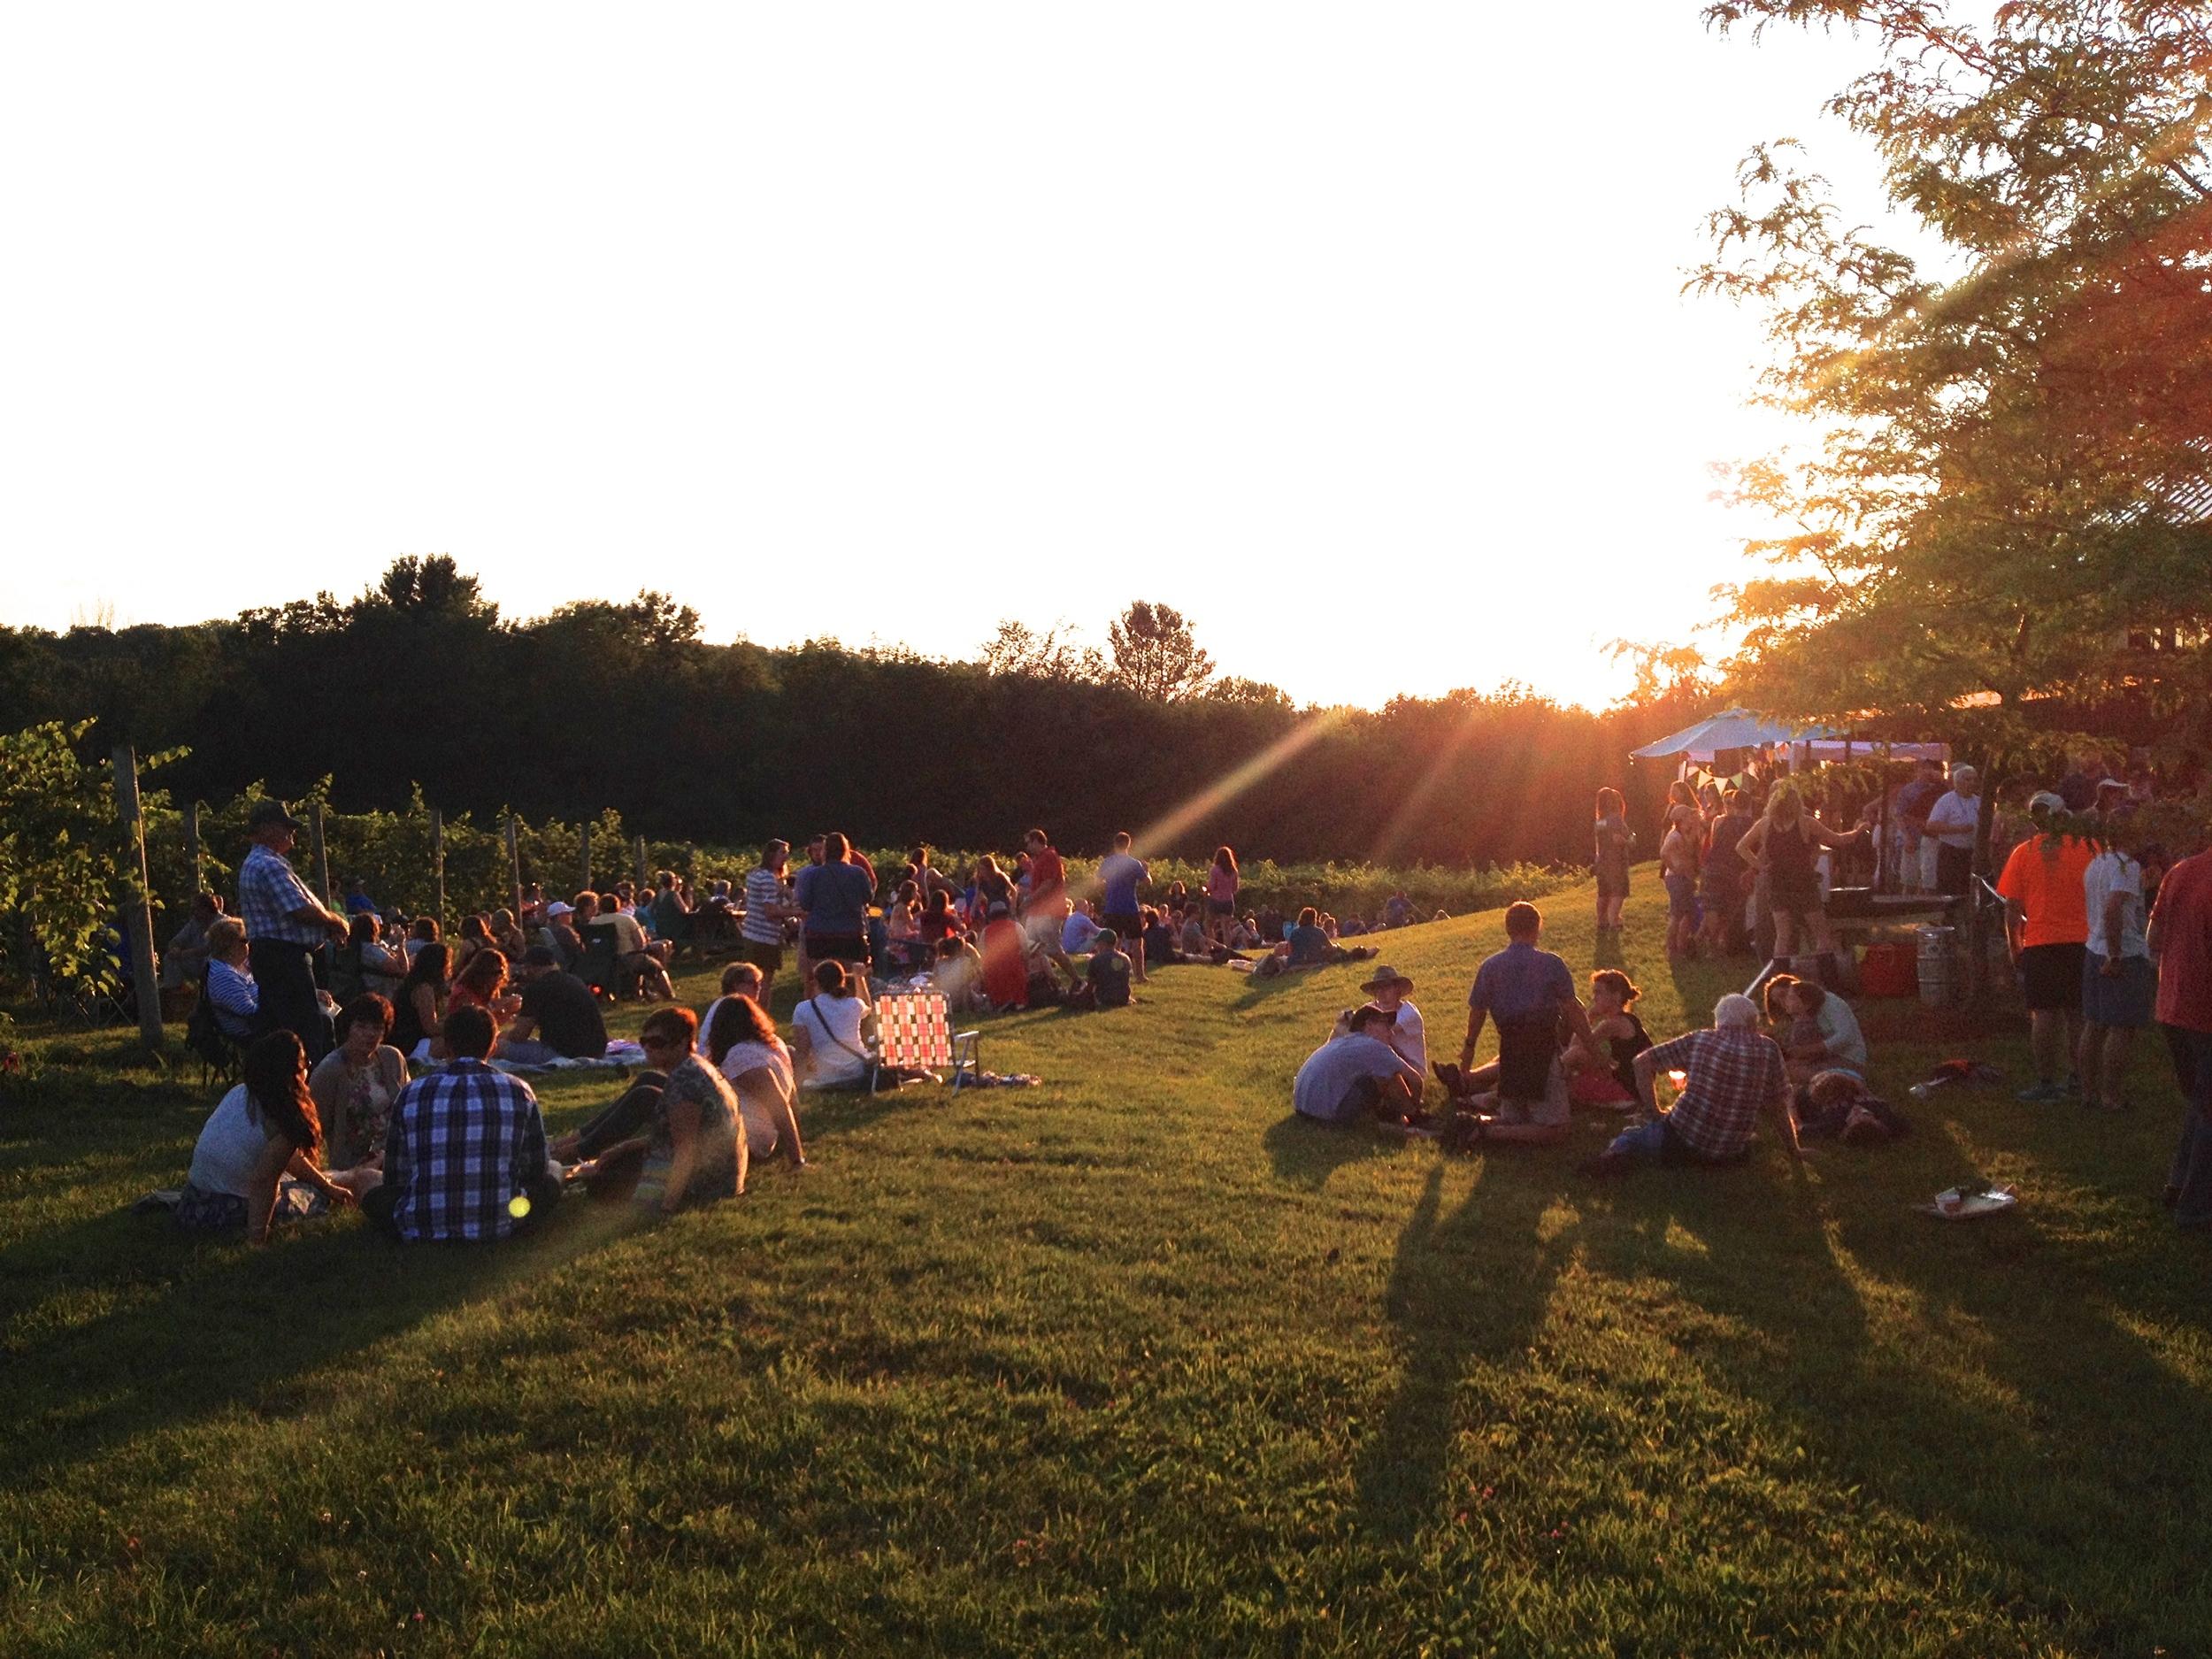 People enjoying a vineyard event outside